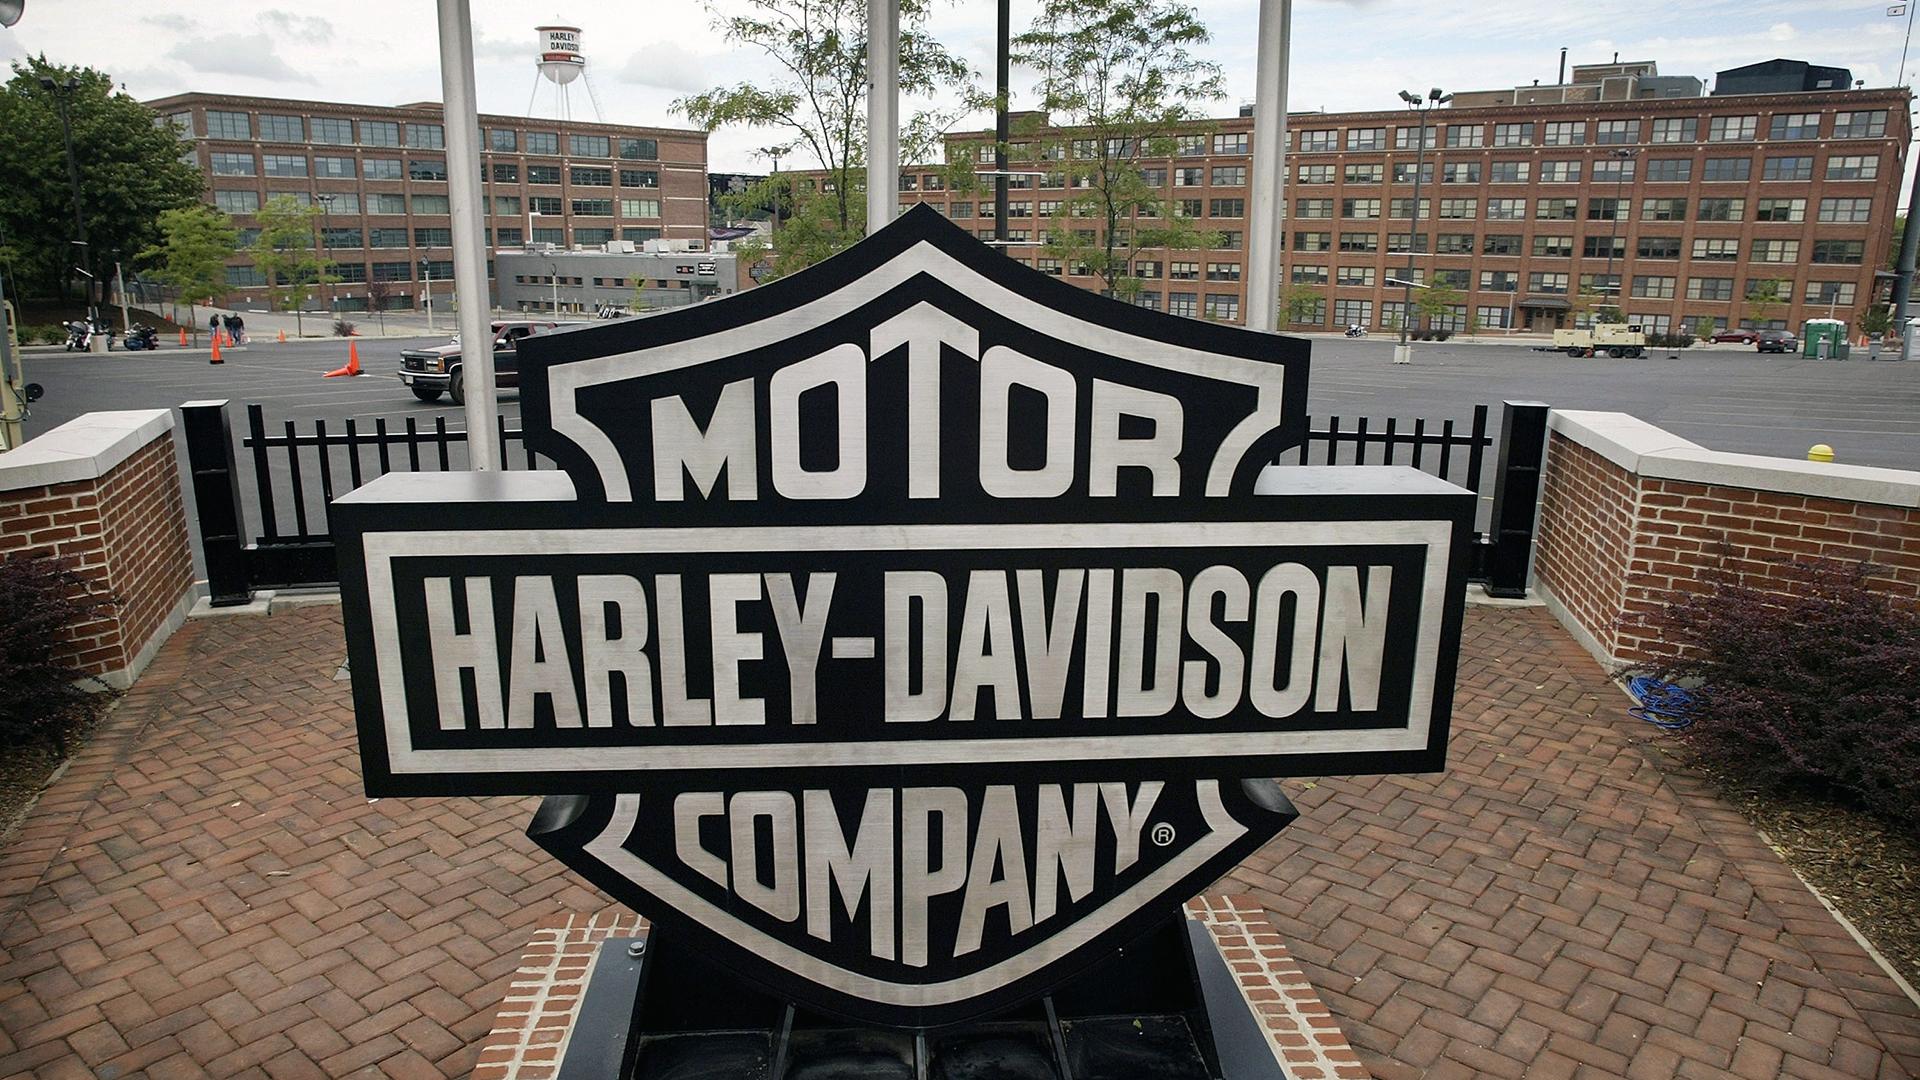 Harley-Davidson headquarters in Milwaukee-159532.jpg29799409